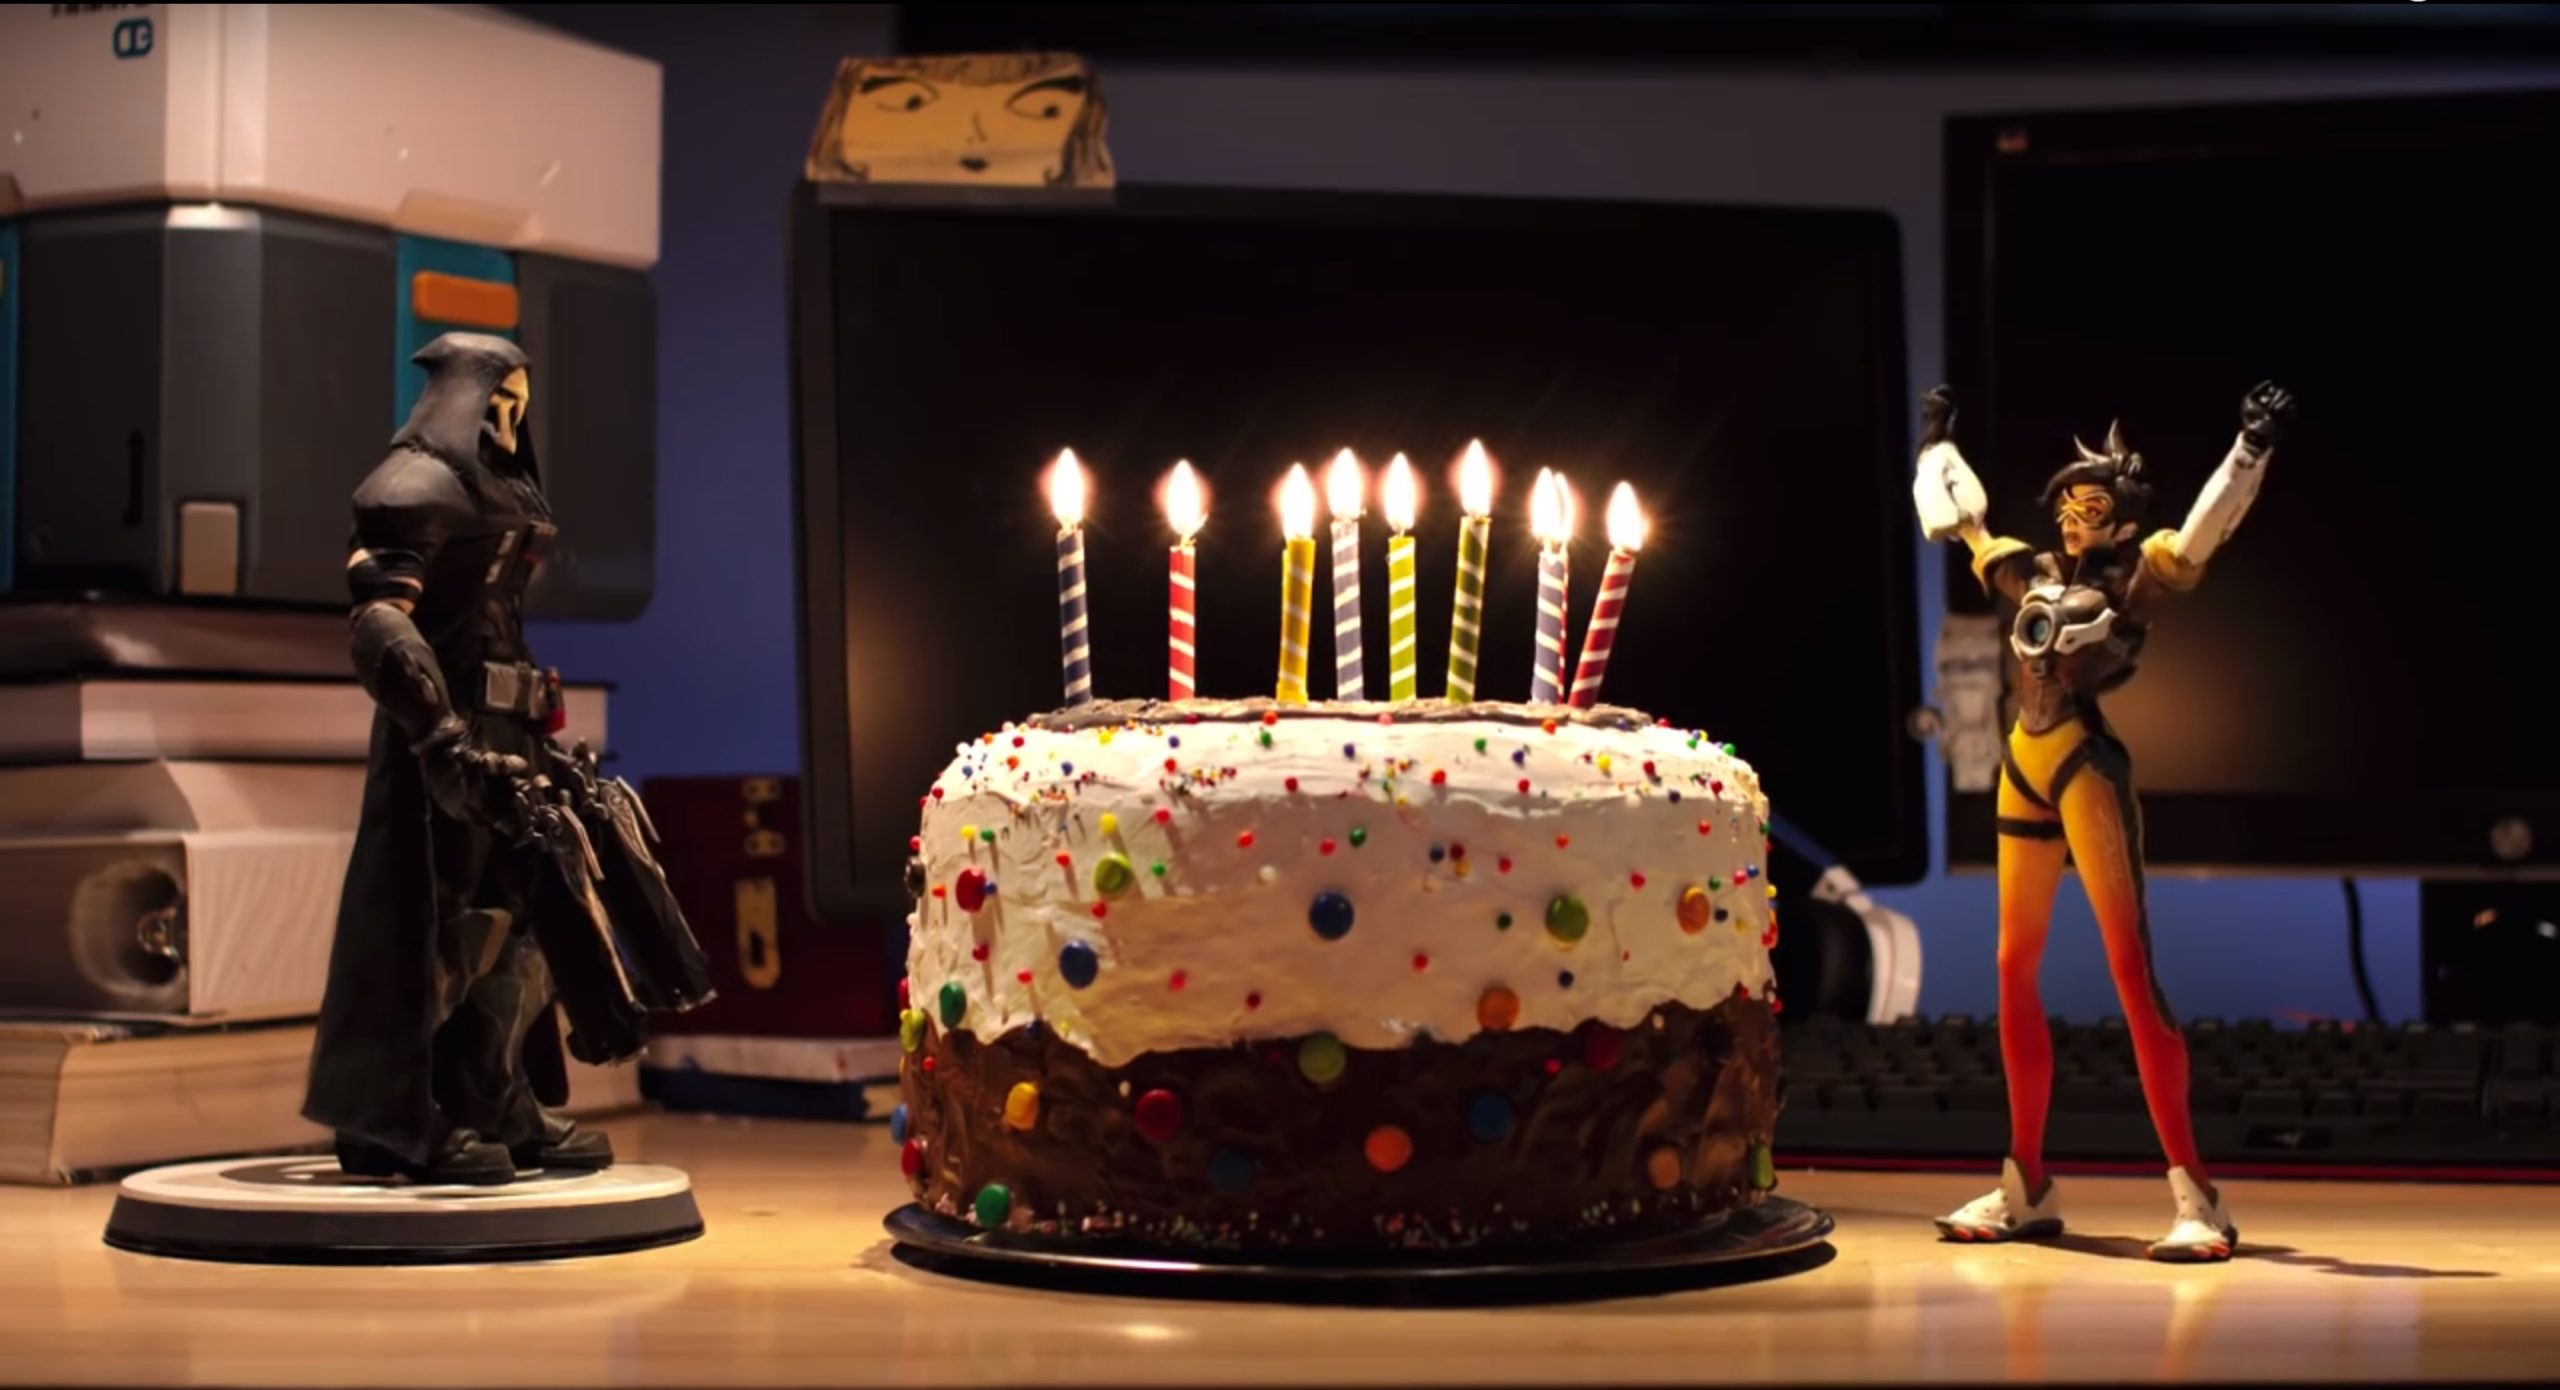 Overwatch Trace & Bake